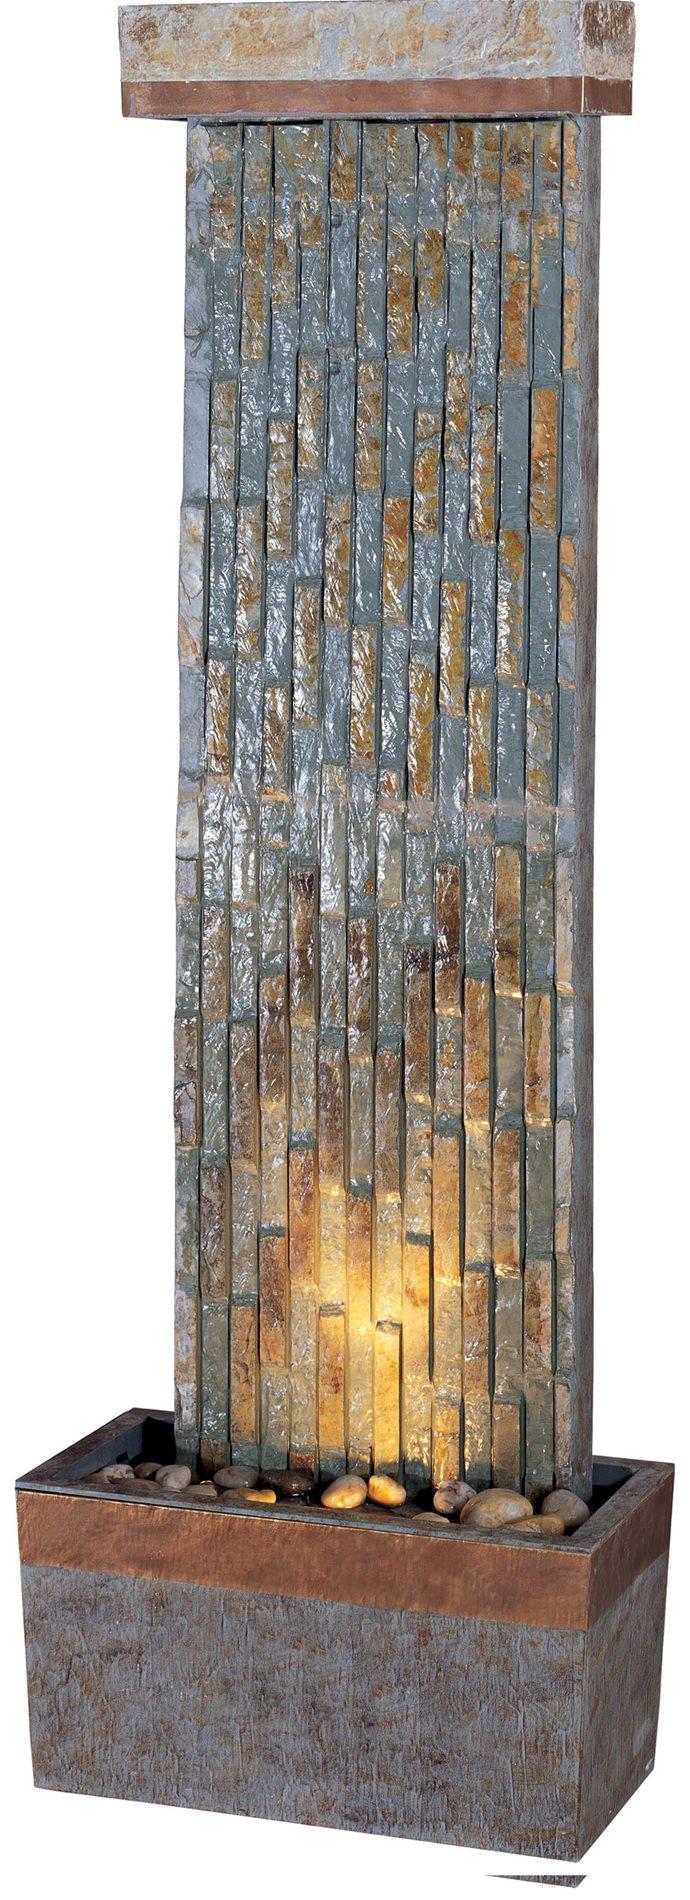 Kenroy 50294slcop Tacora Vertical Floor Fountain Kr 50294